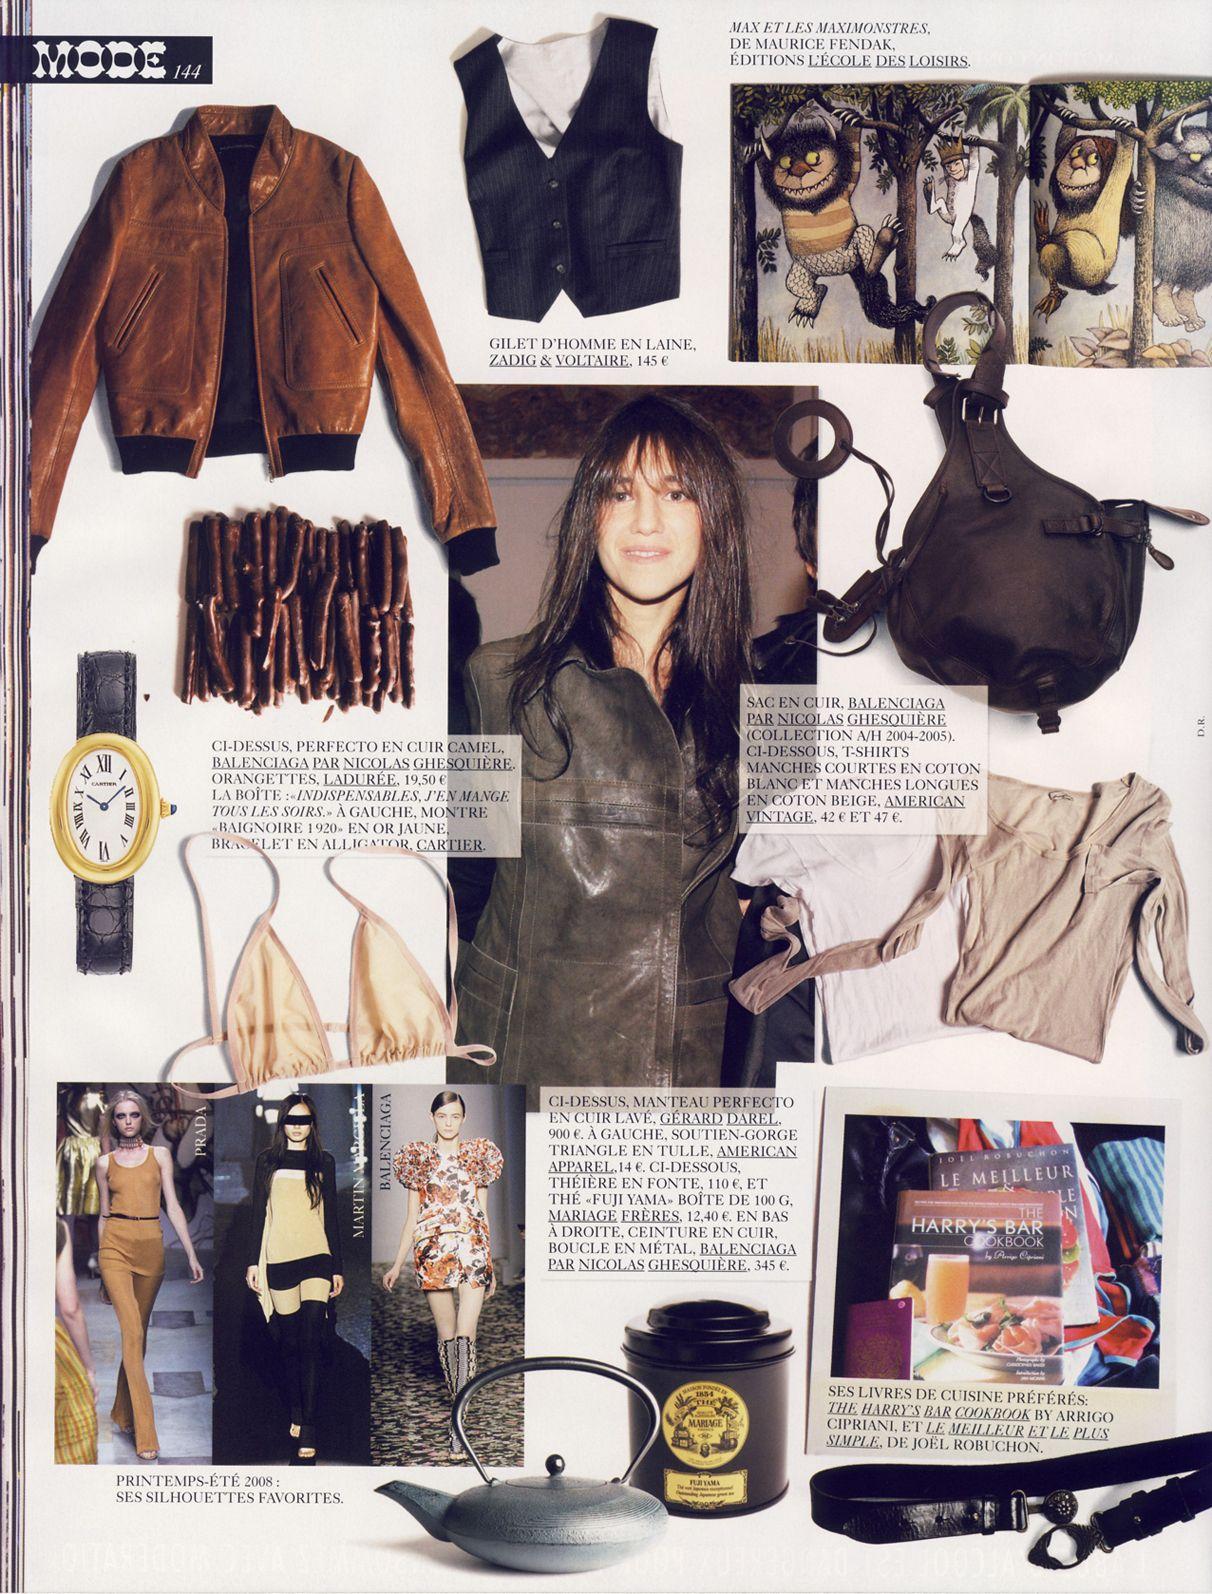 Charlotte Gainsbourg per French Vogue   Одежда   Charlotte ... 6daa86825b4c